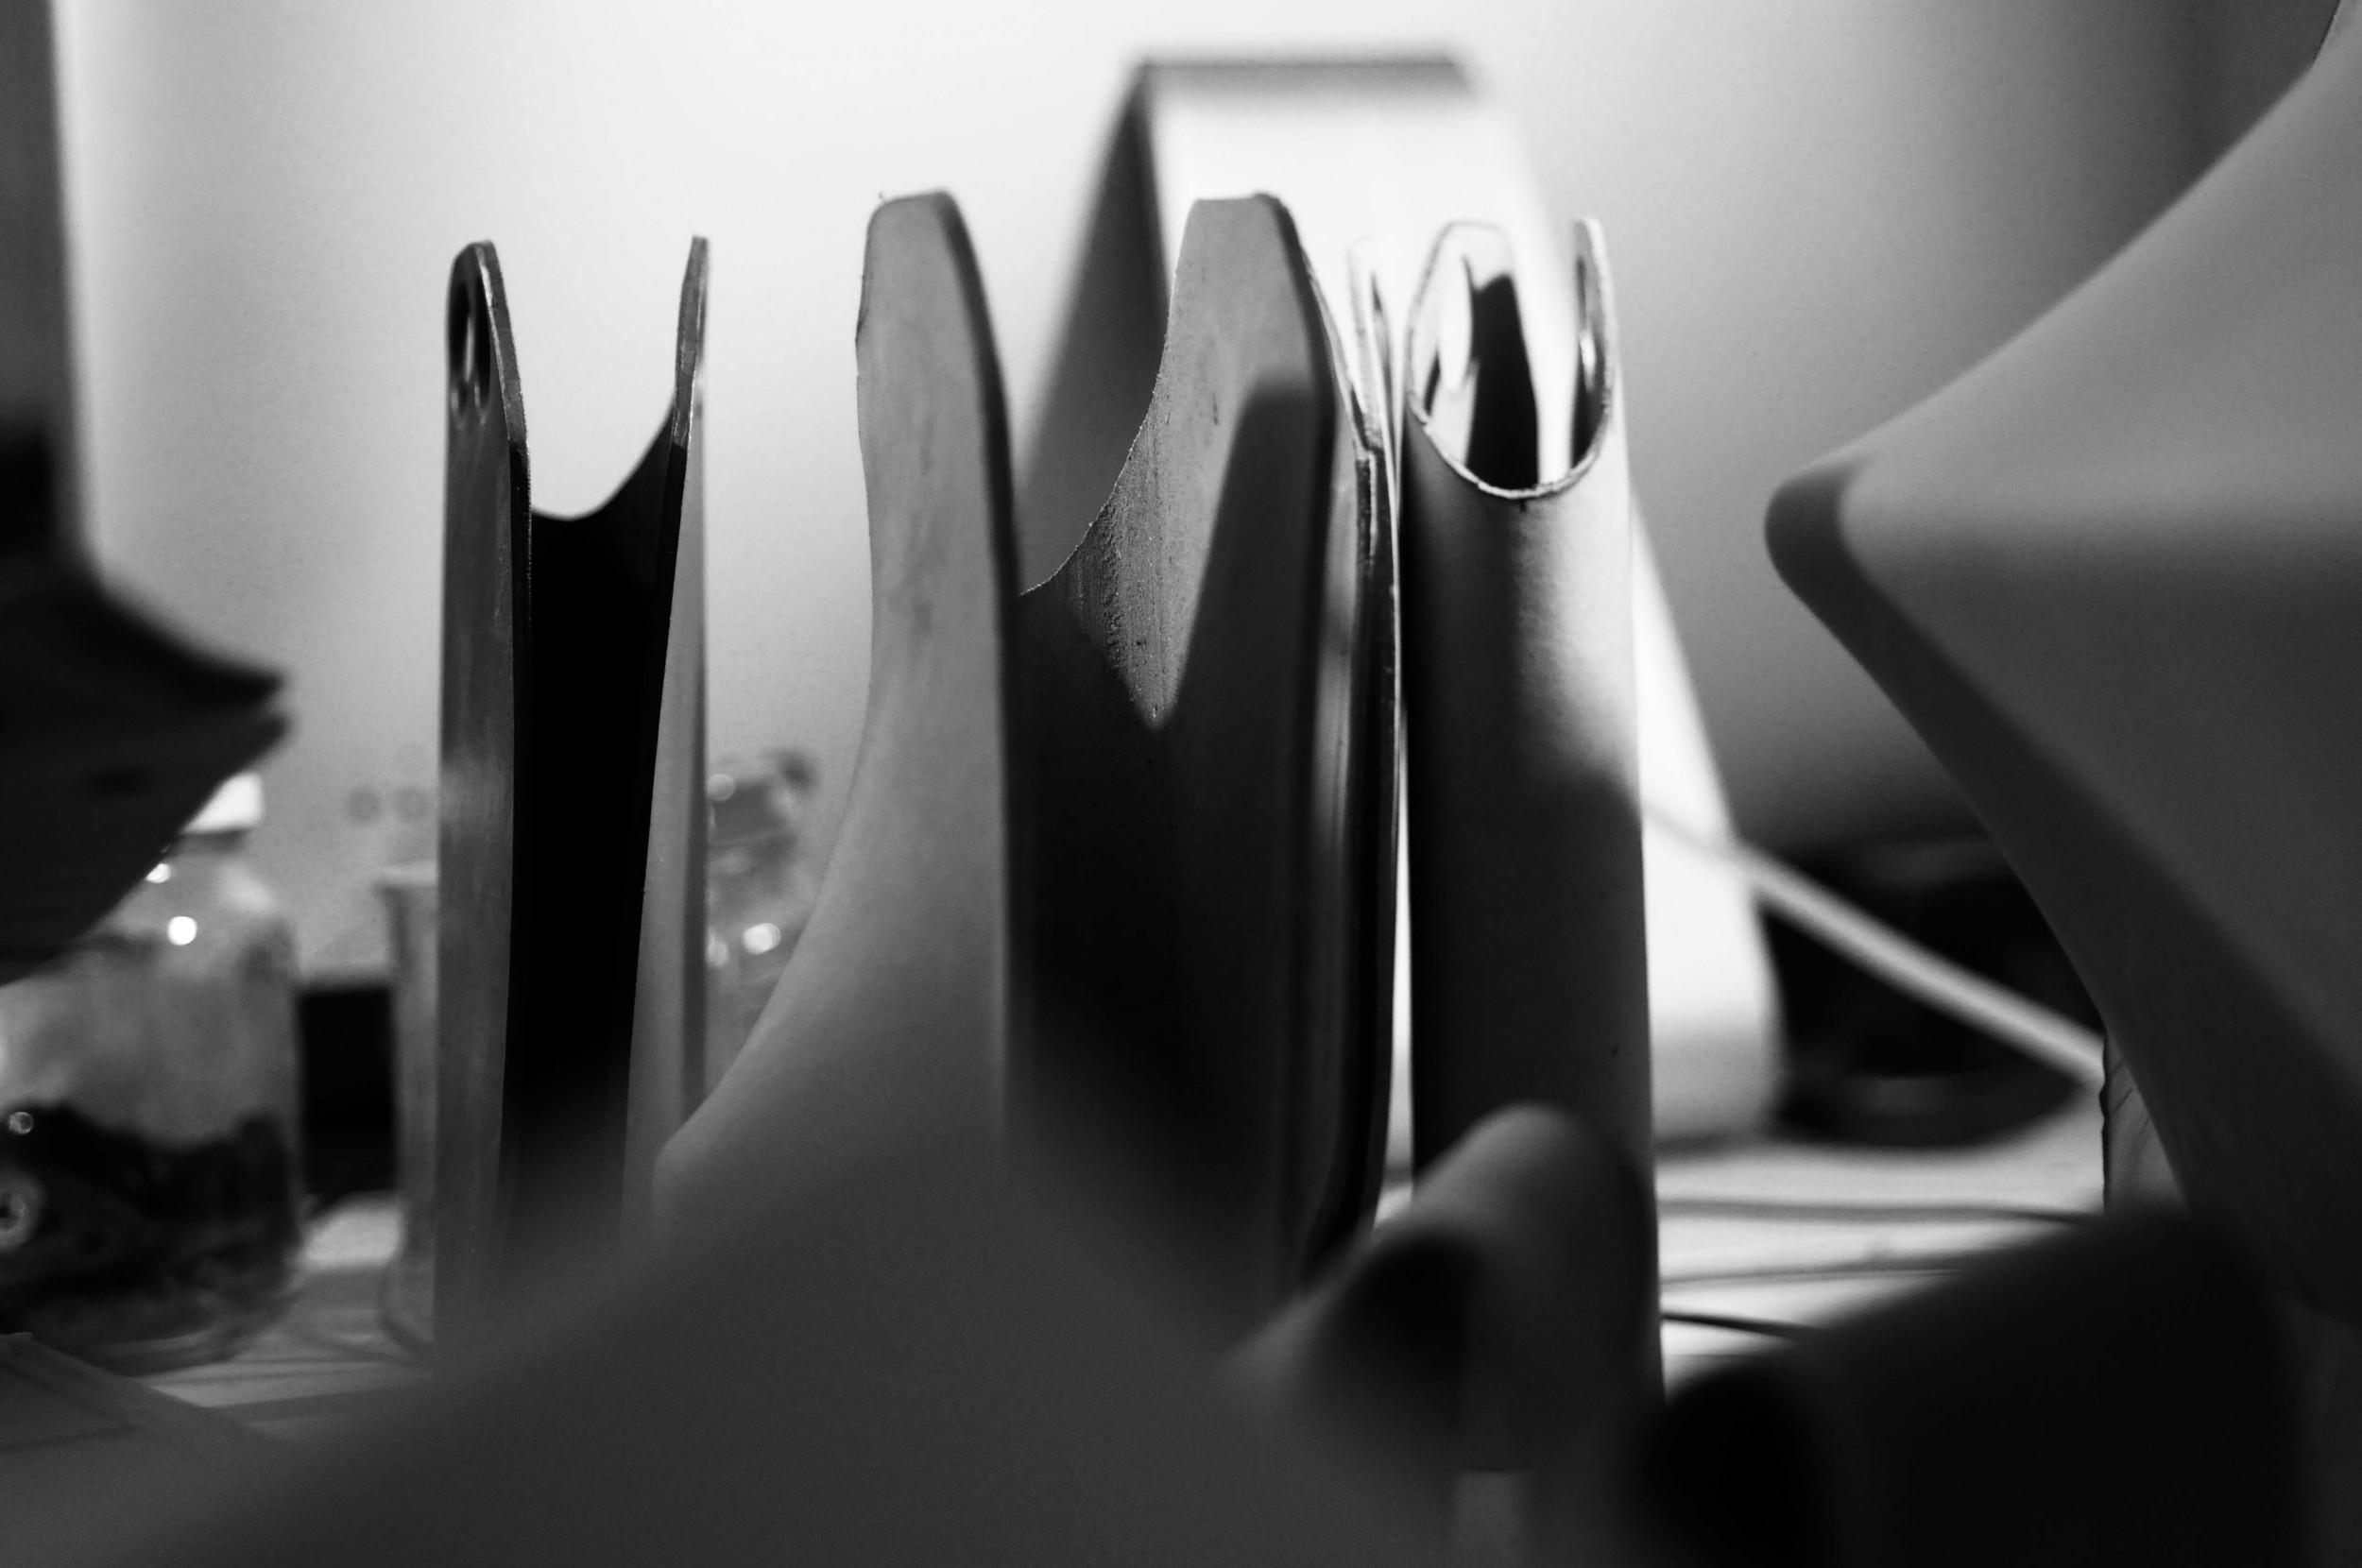 khourianbeer atelier by james cheng tan   S/TUDIO